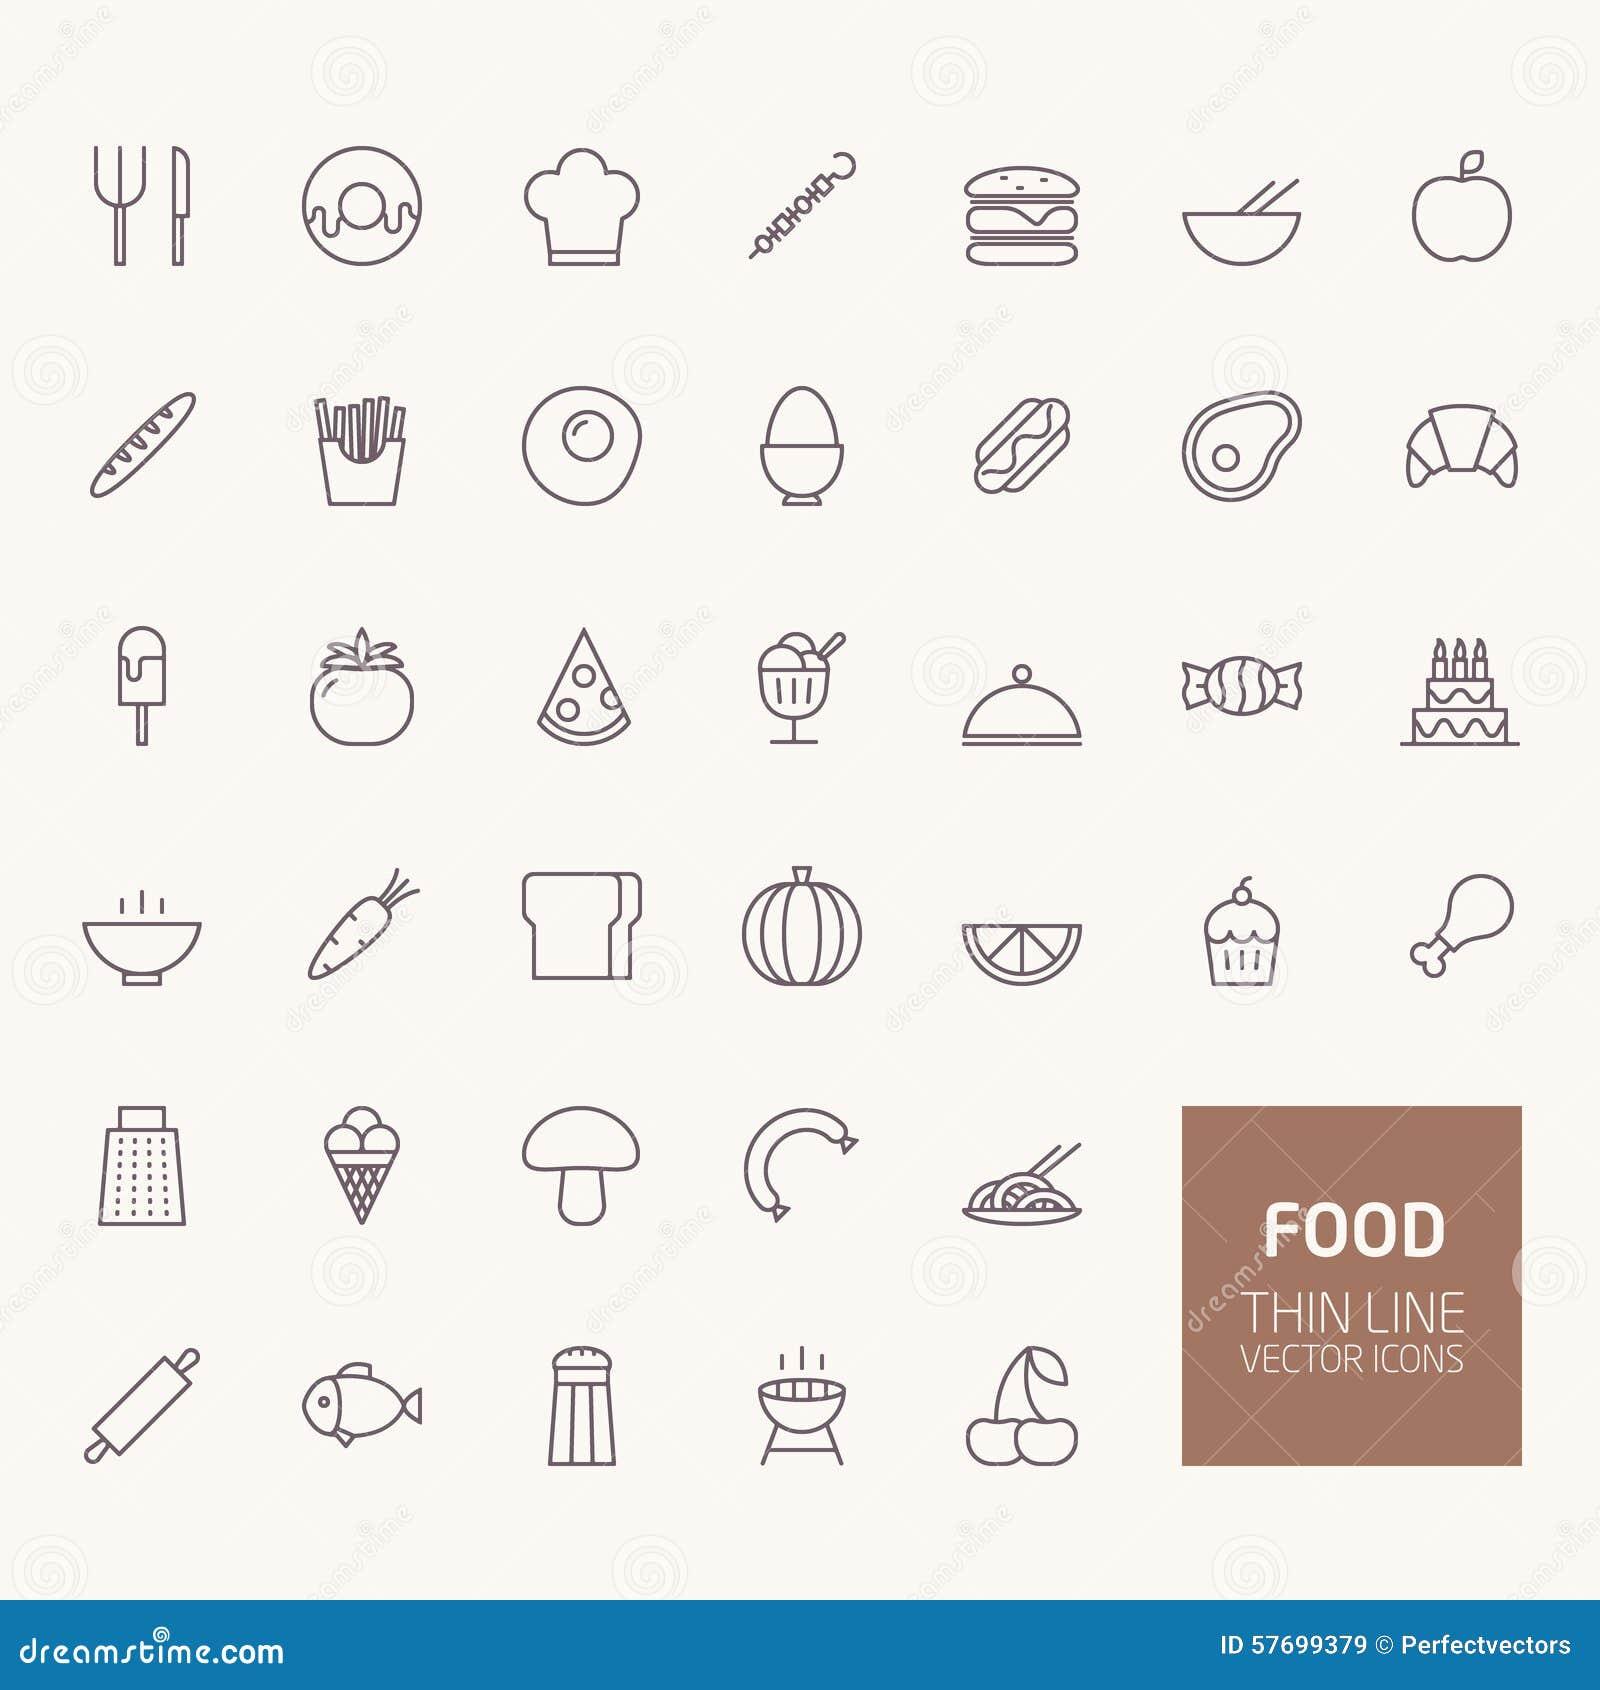 Web App Icons